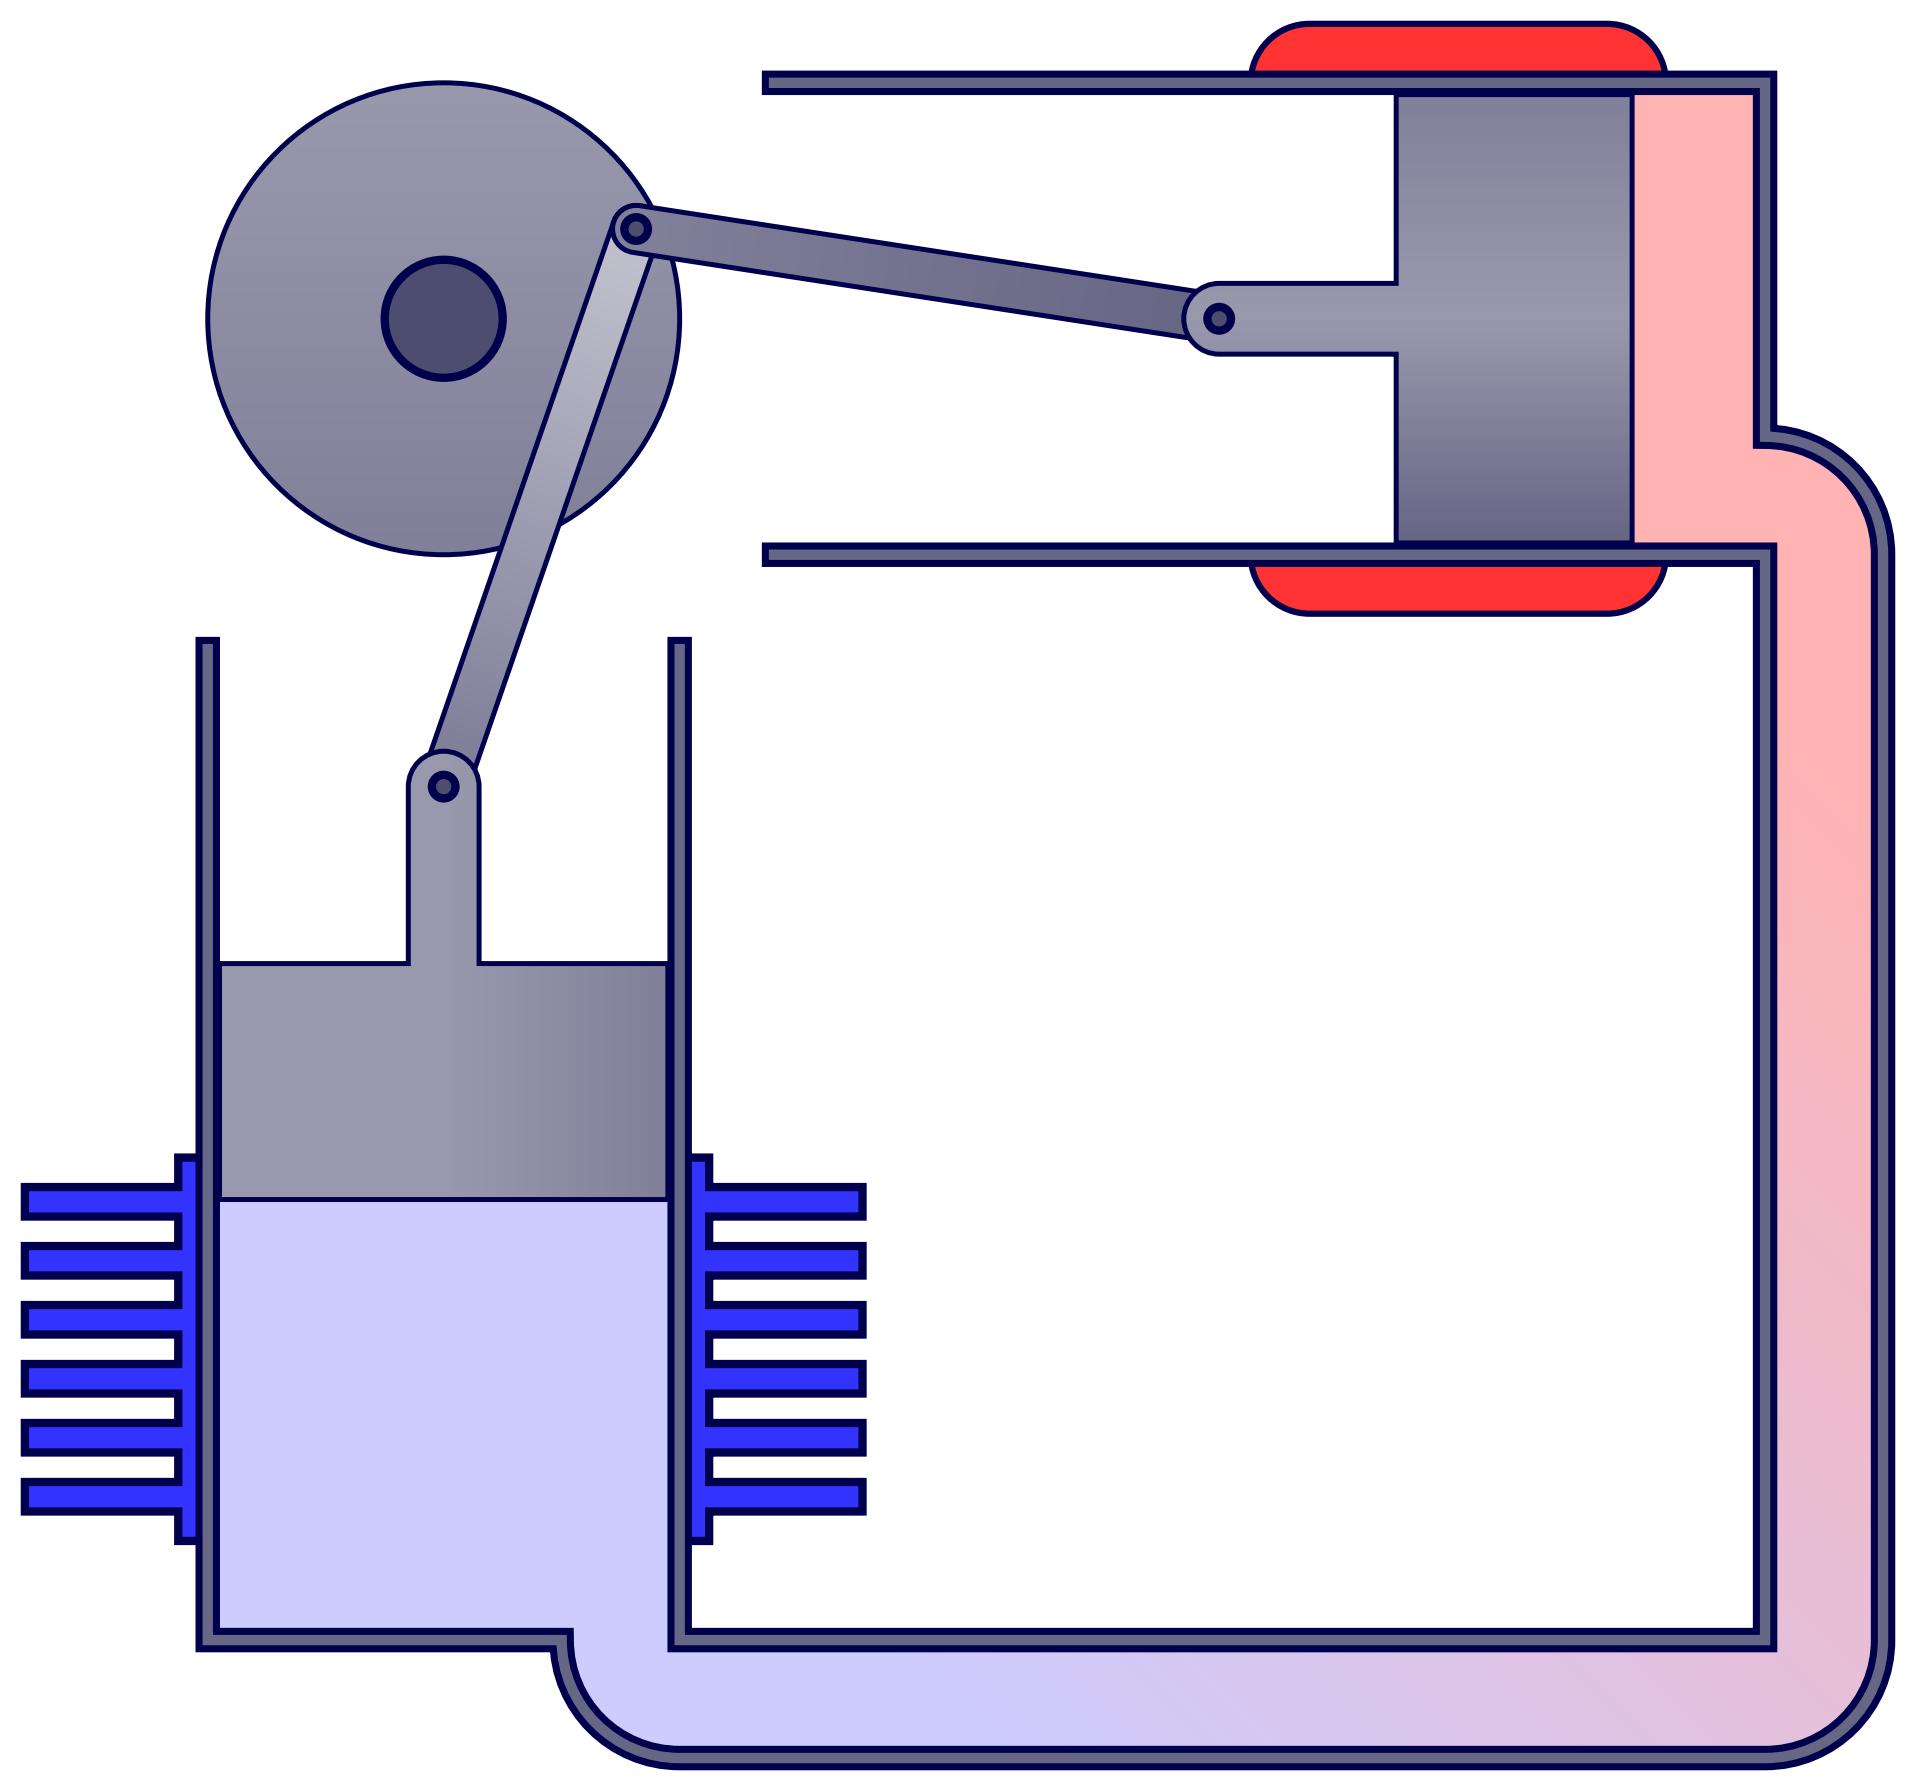 TikZ 绘制阿尔法型斯特林发动机